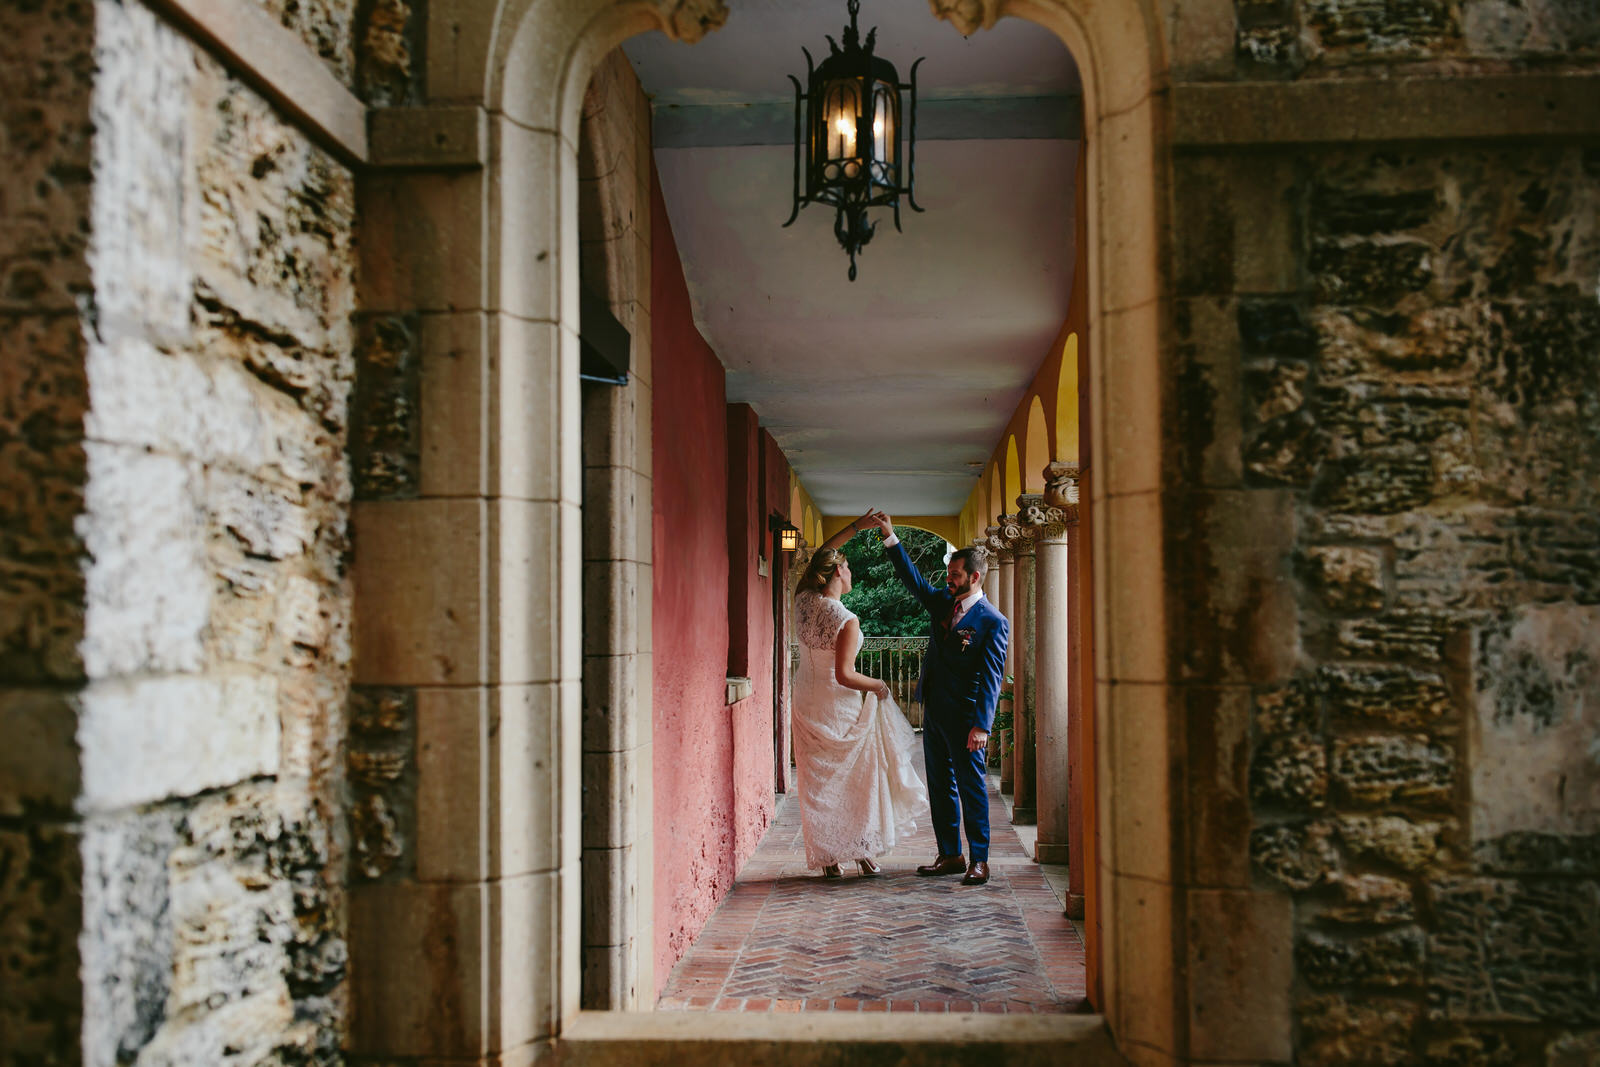 bride_groom_deering_estate_wedding_tiny_house_photo_miami_photographer-81.jpg